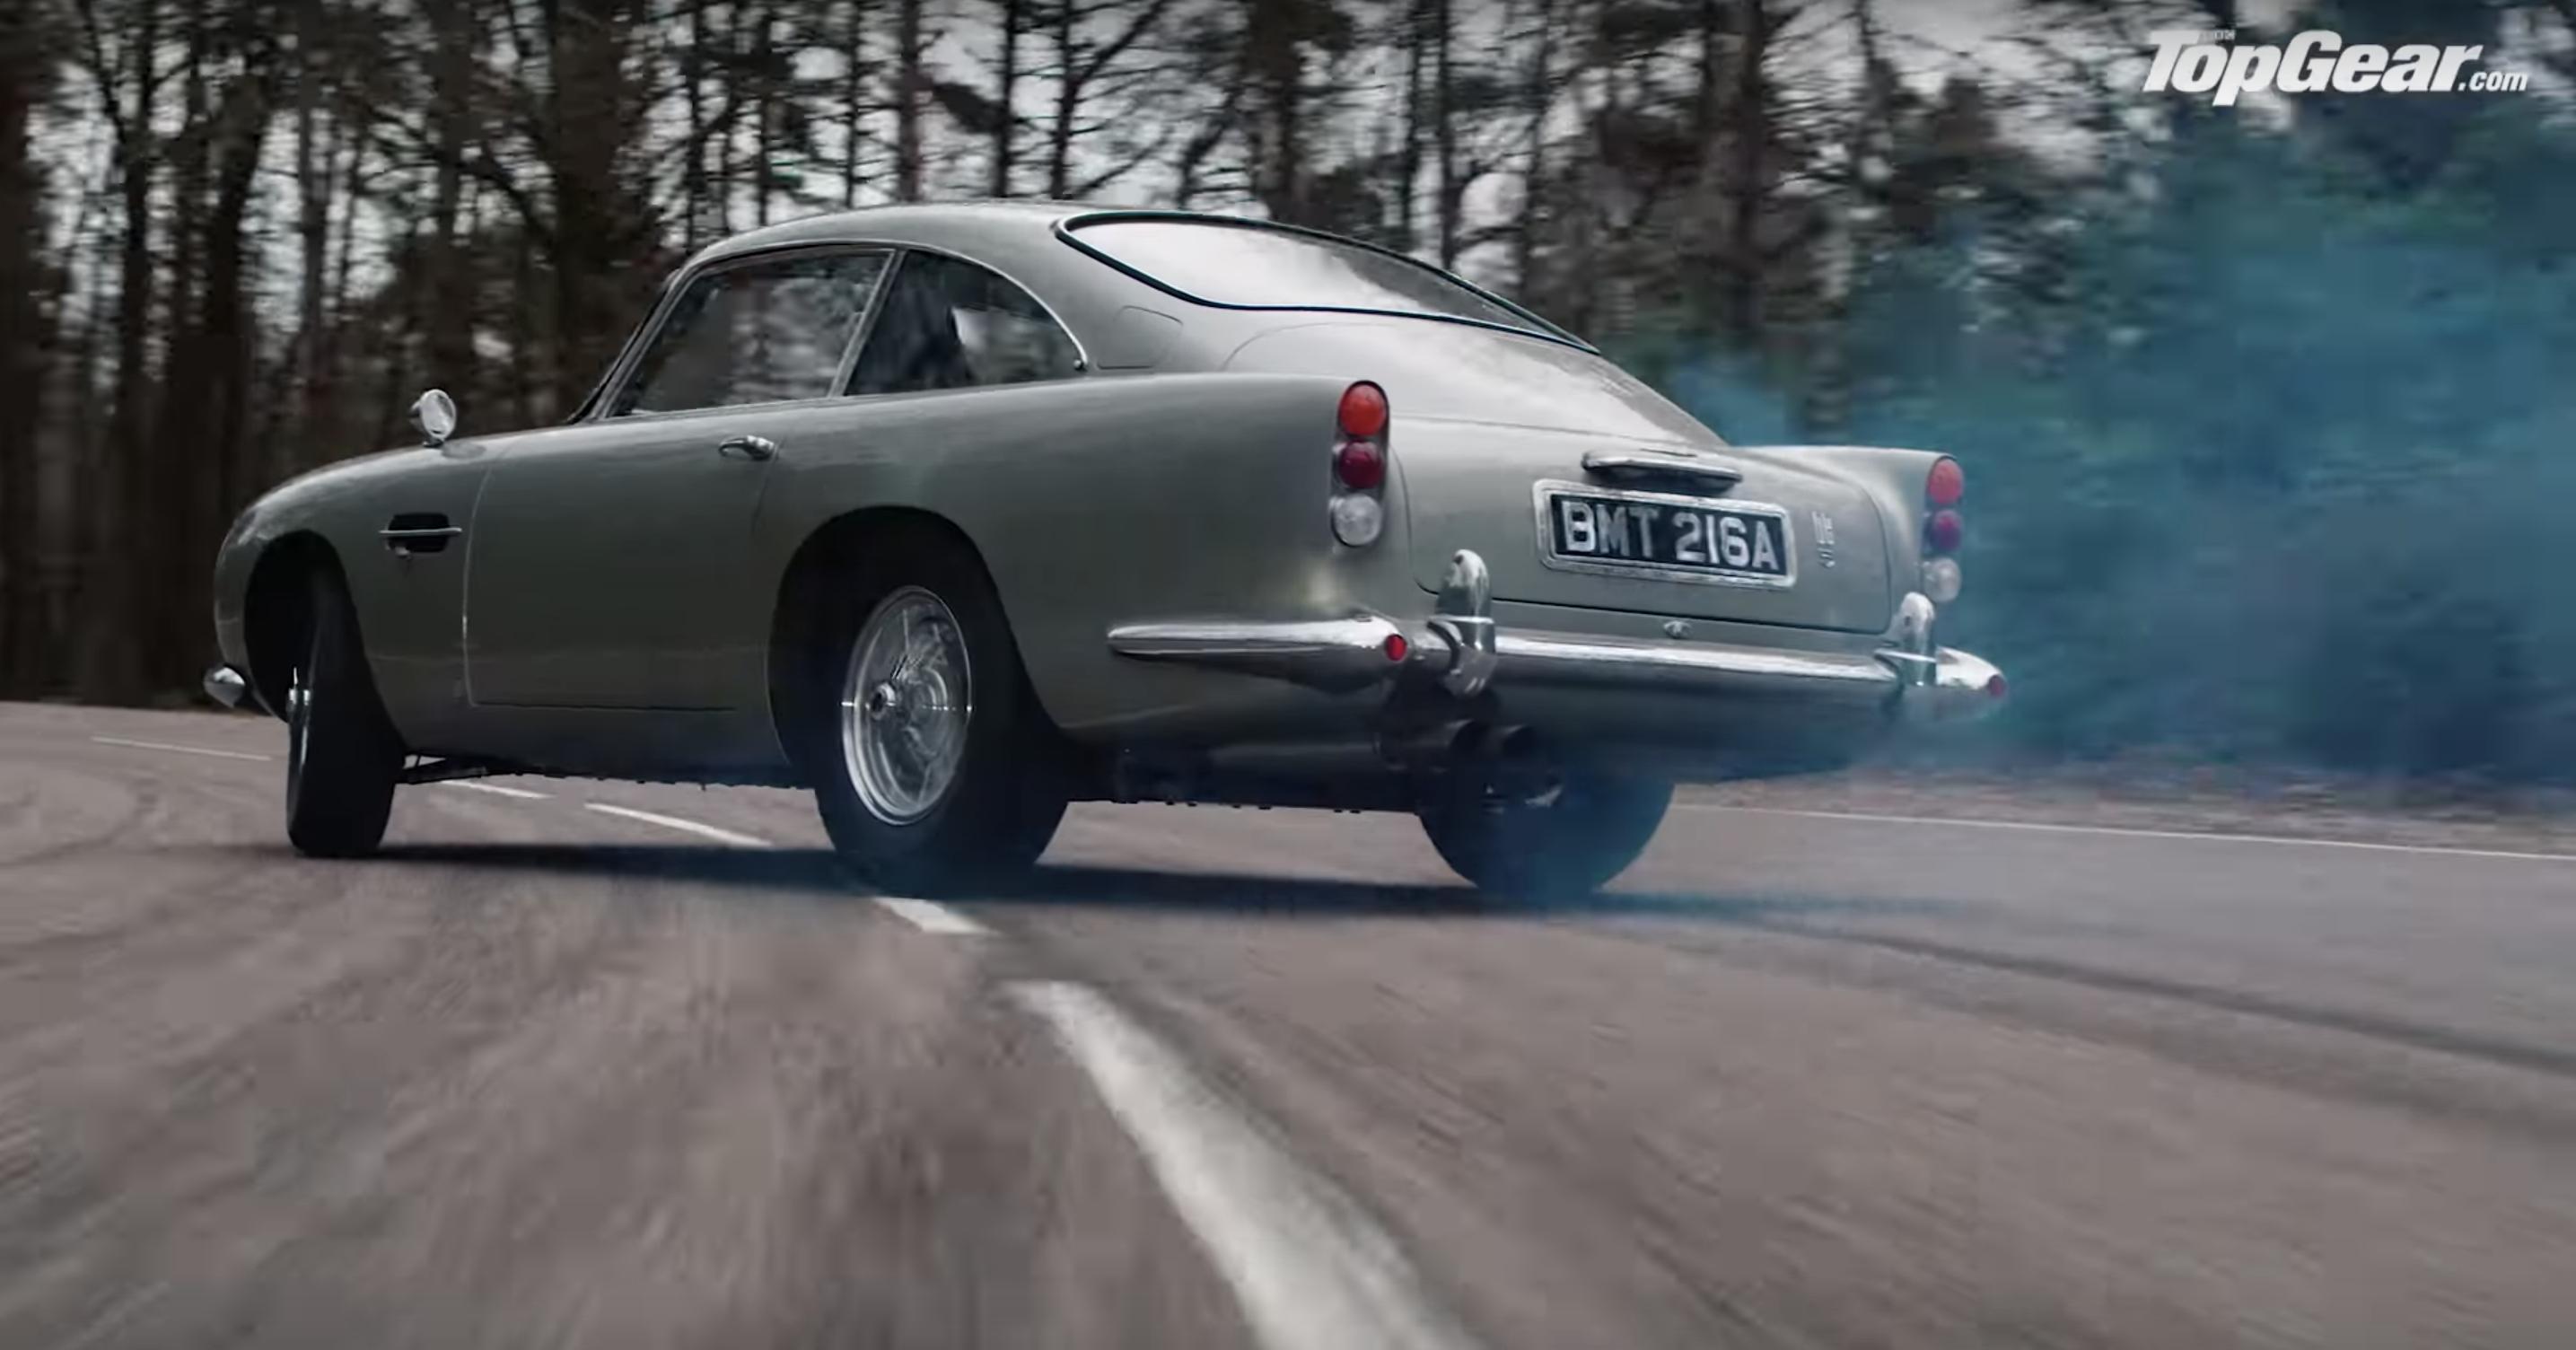 The Best James Bond Car Is This Aston Martin Db5 Drift Machine